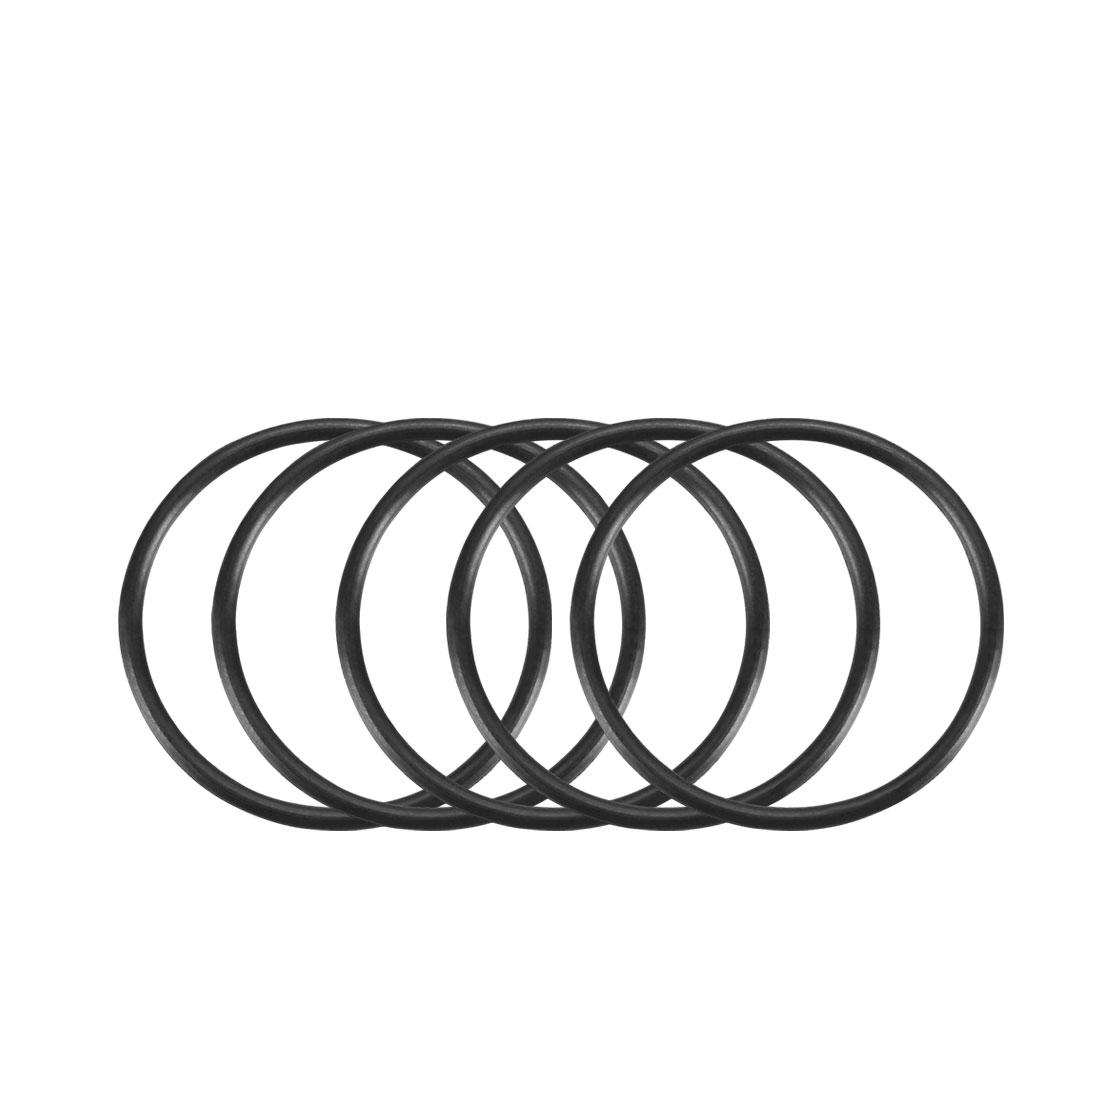 100Pcs Black 18mm x 1mm Nitrile Rubber O Ring NBR Oil Sealing Grommets